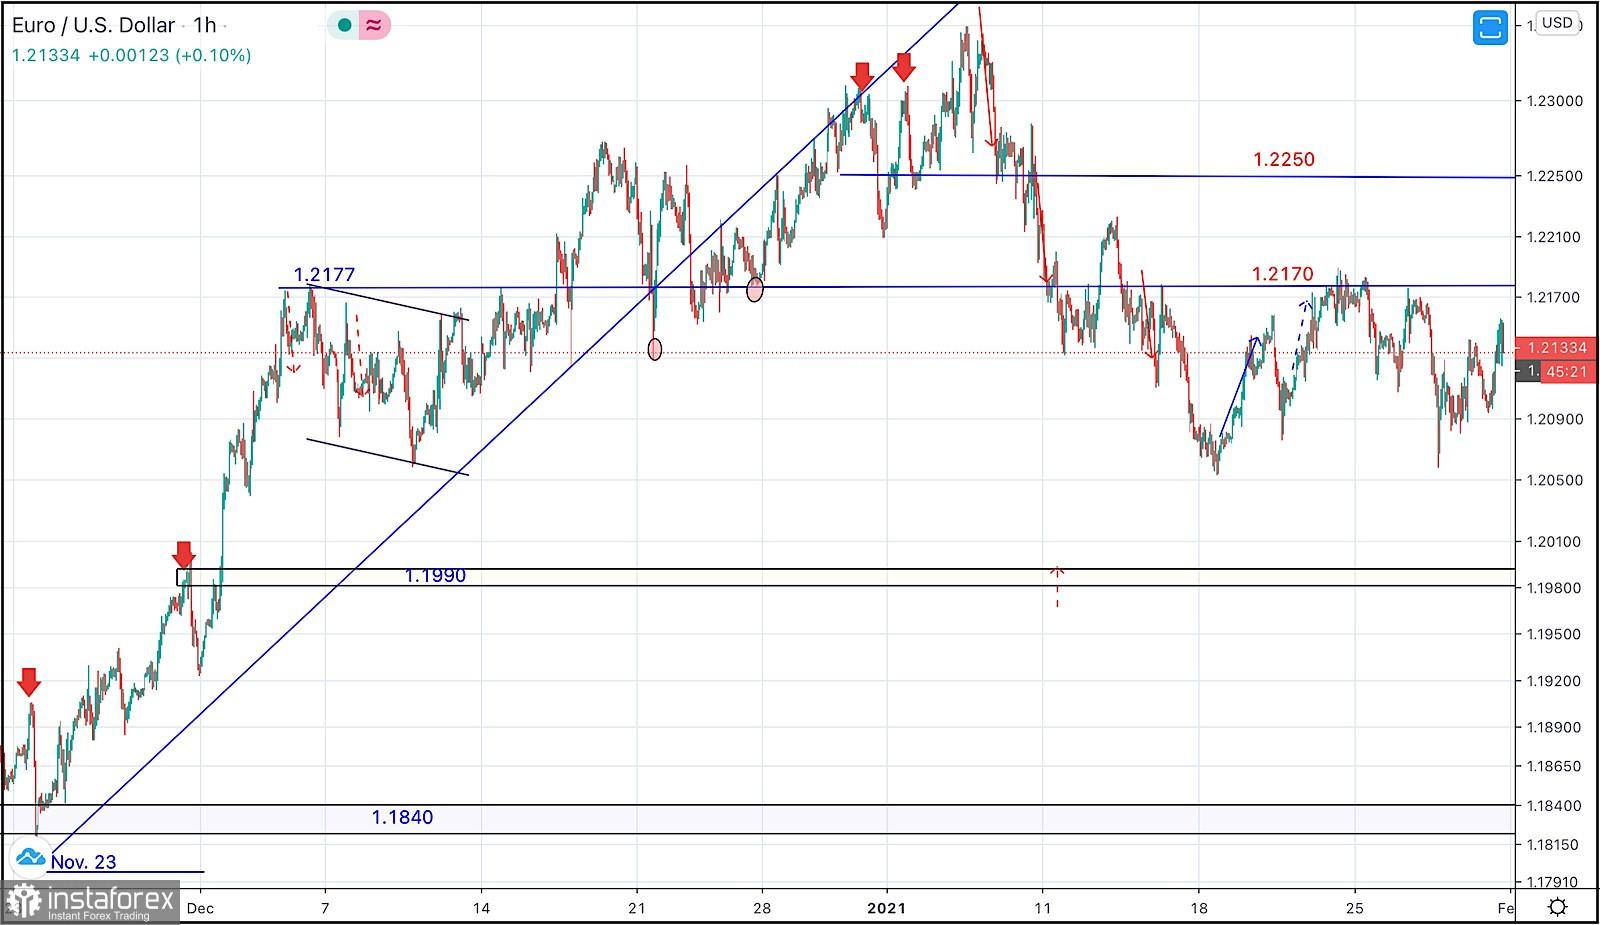 Analisi Settimanale Ok Forex Power Indicator – 28 giugno - 2 luglio EUR/USD USD/CAD USD/JPY